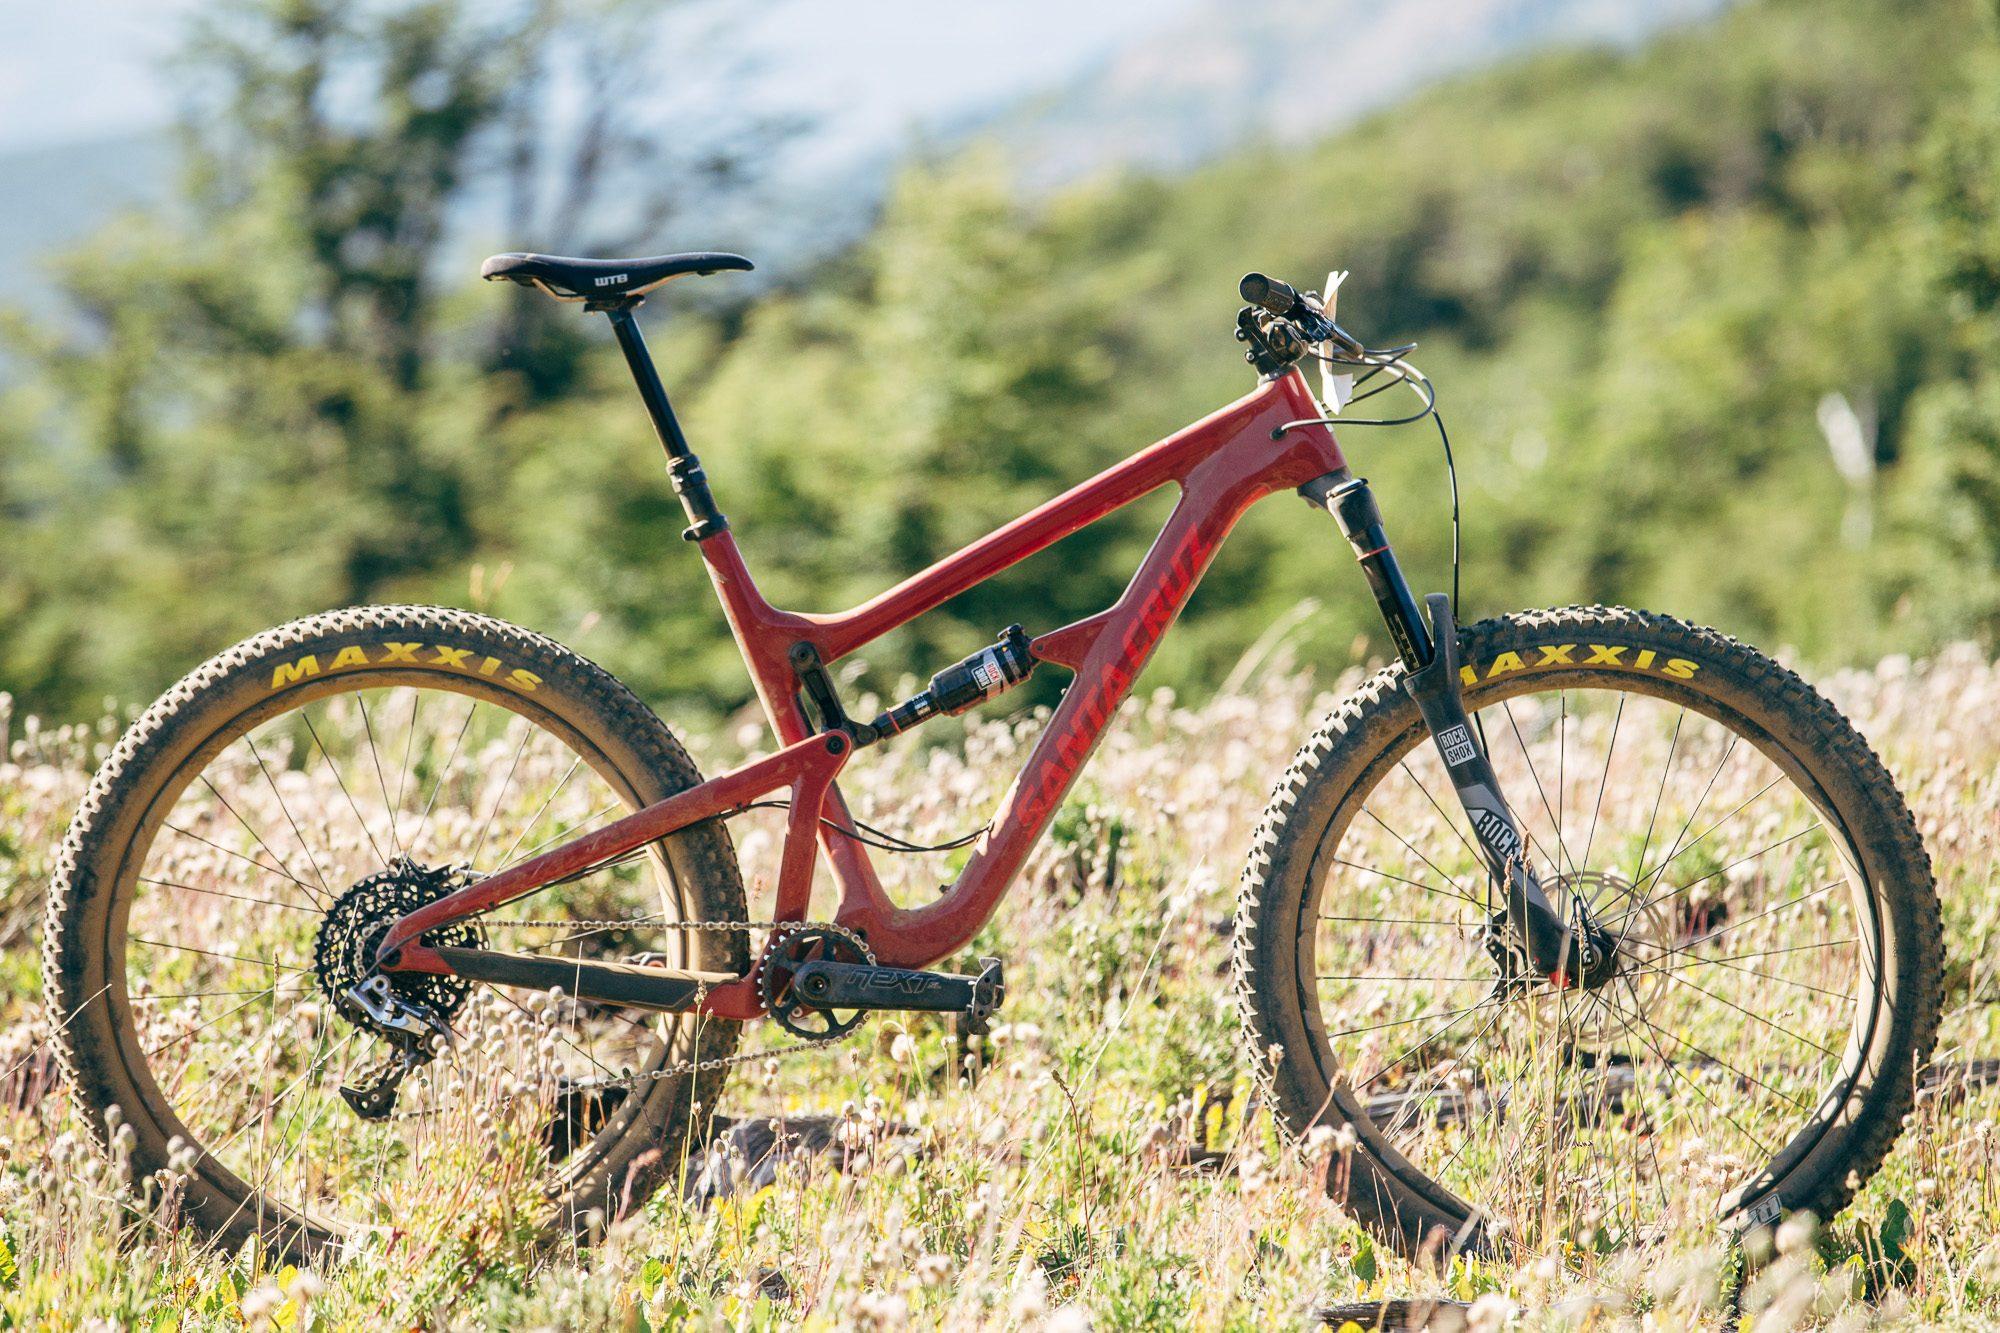 The Santa Cruz Bicycles Hightower with 27.5+ Wheels